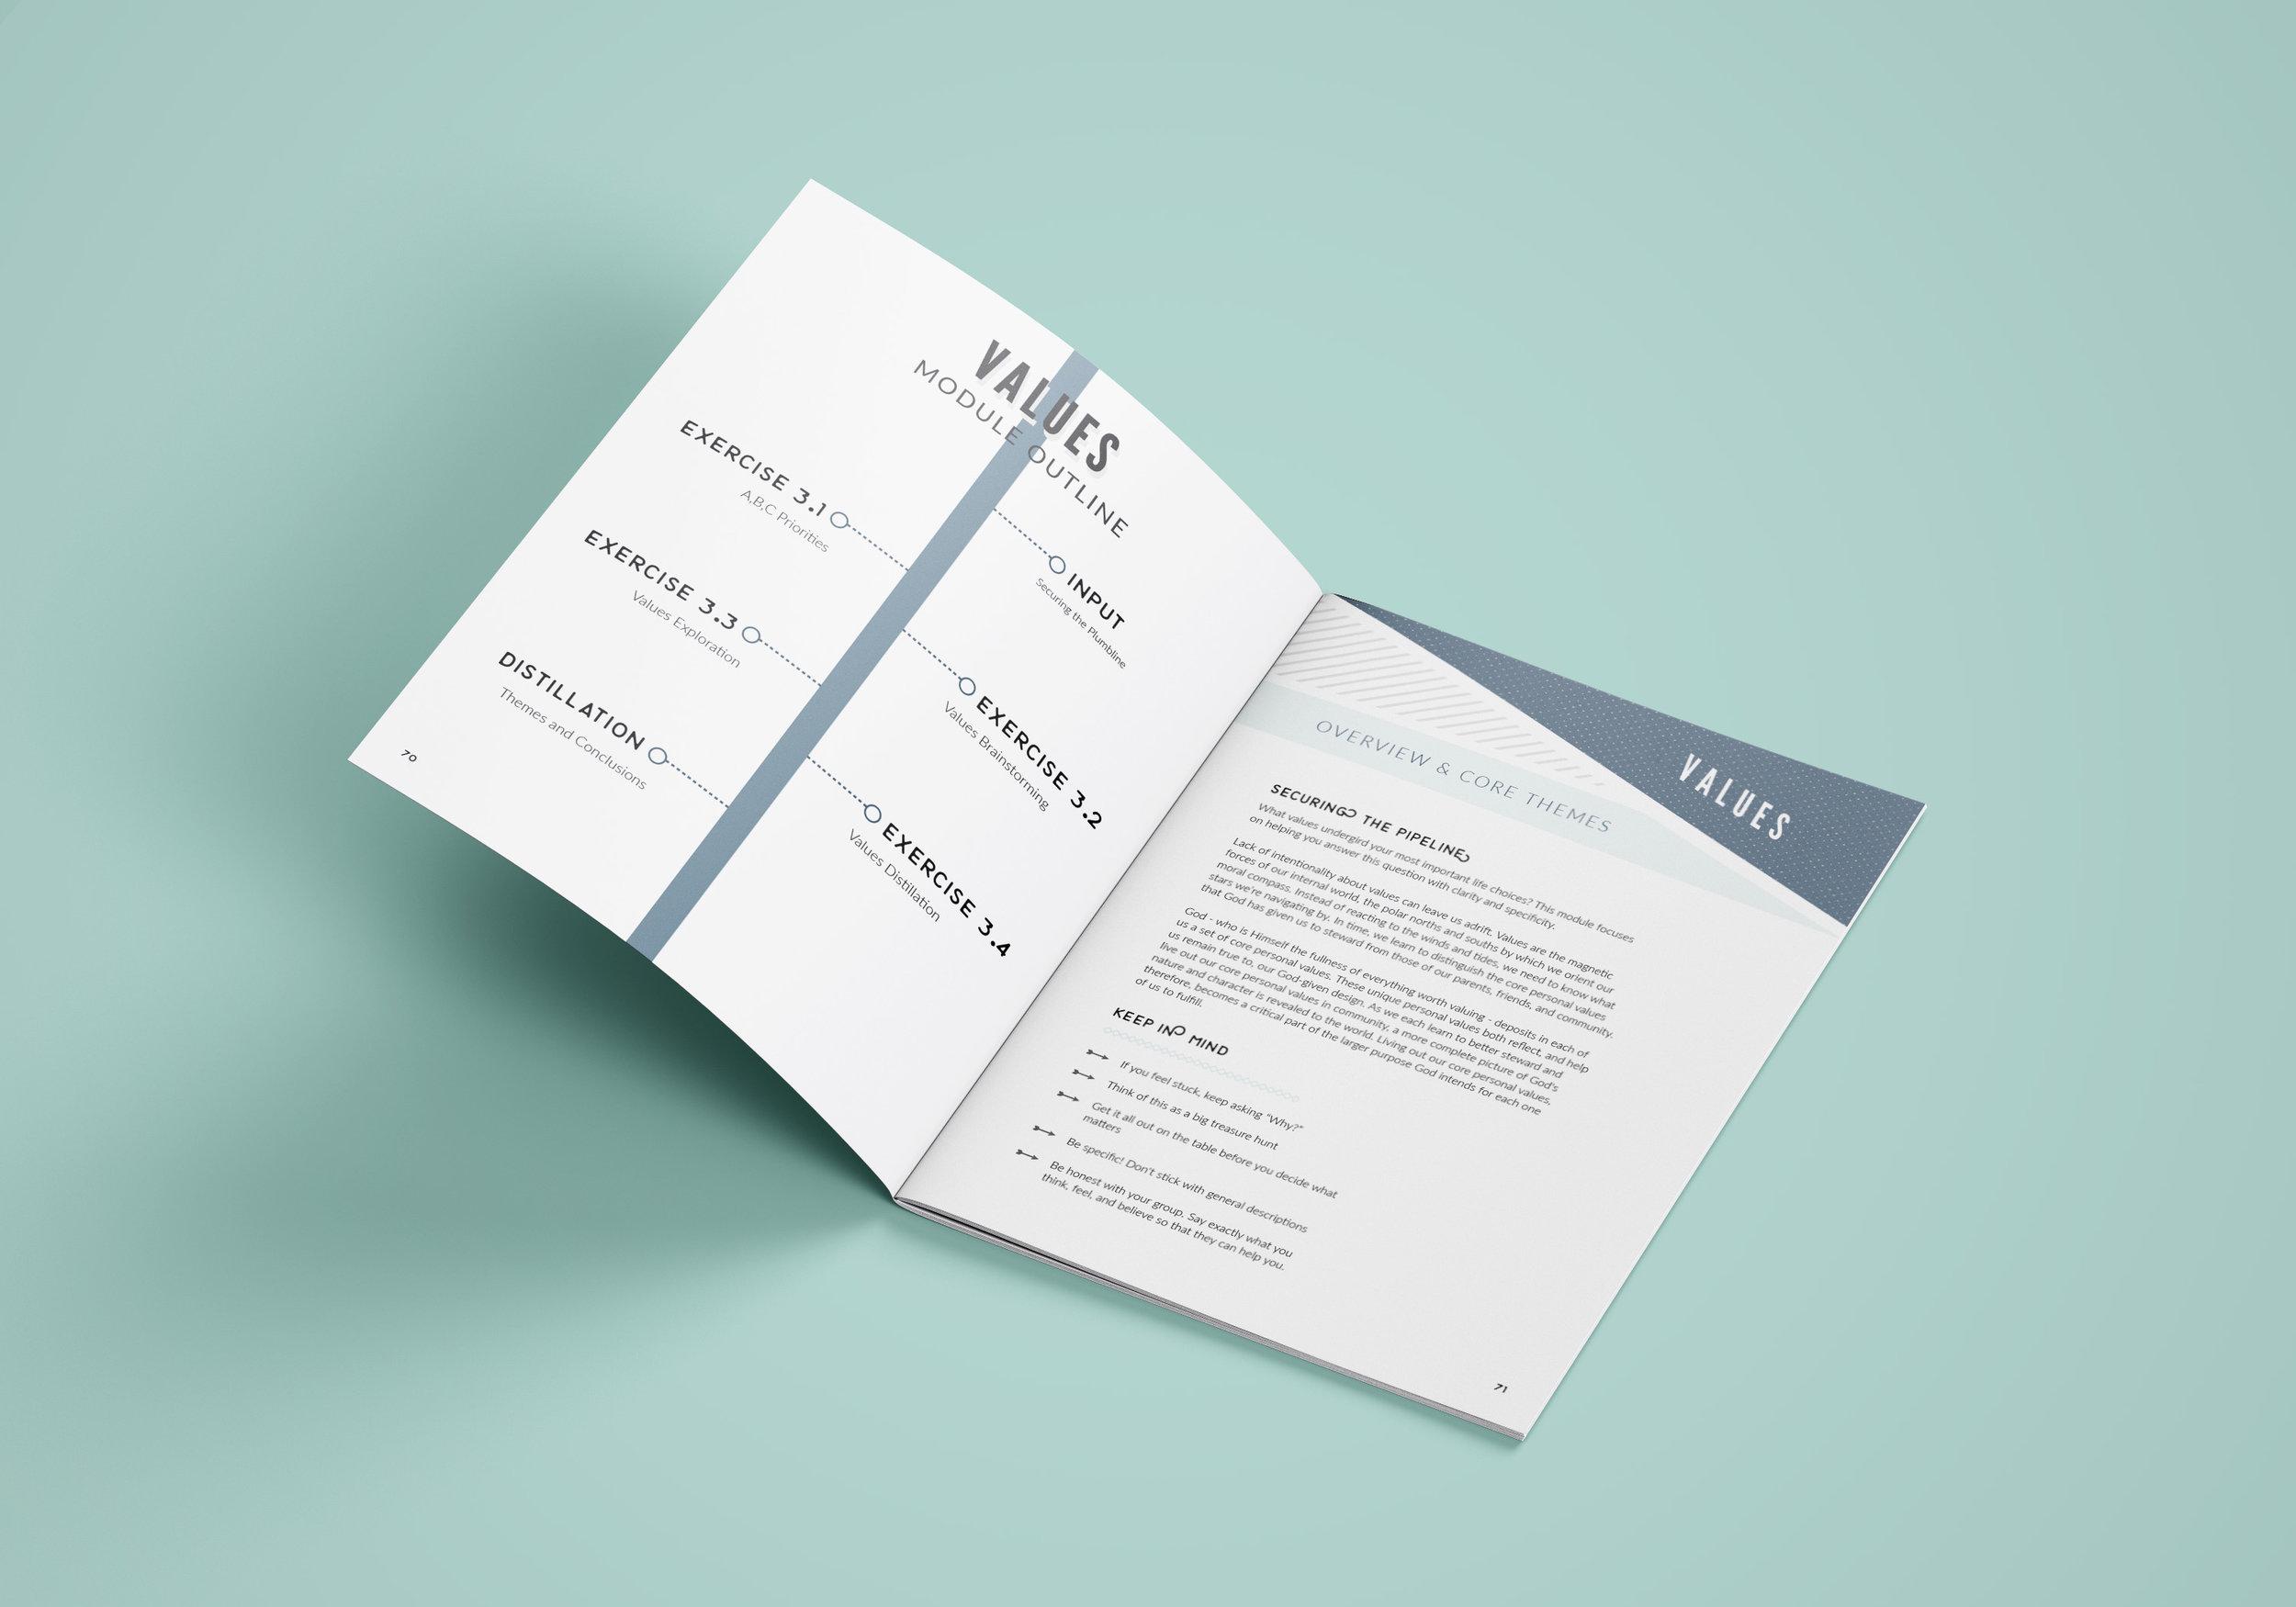 LBD_book5.jpg